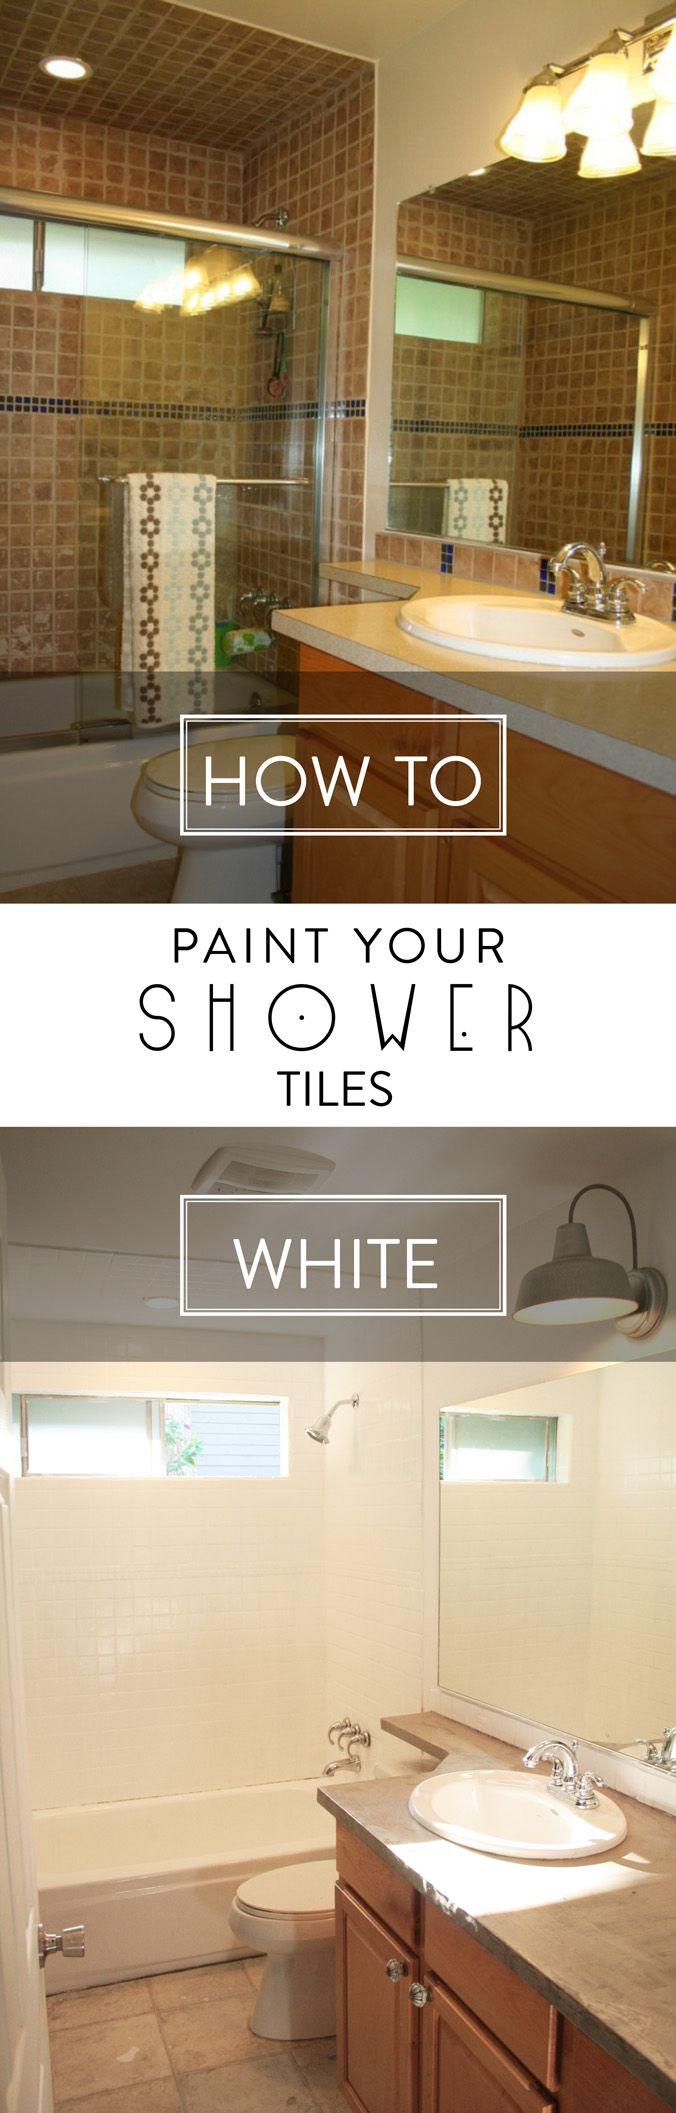 Painting Wall Tiles Kitchen 25 Best Ideas About Paint Tiles On Pinterest Paint Bathroom